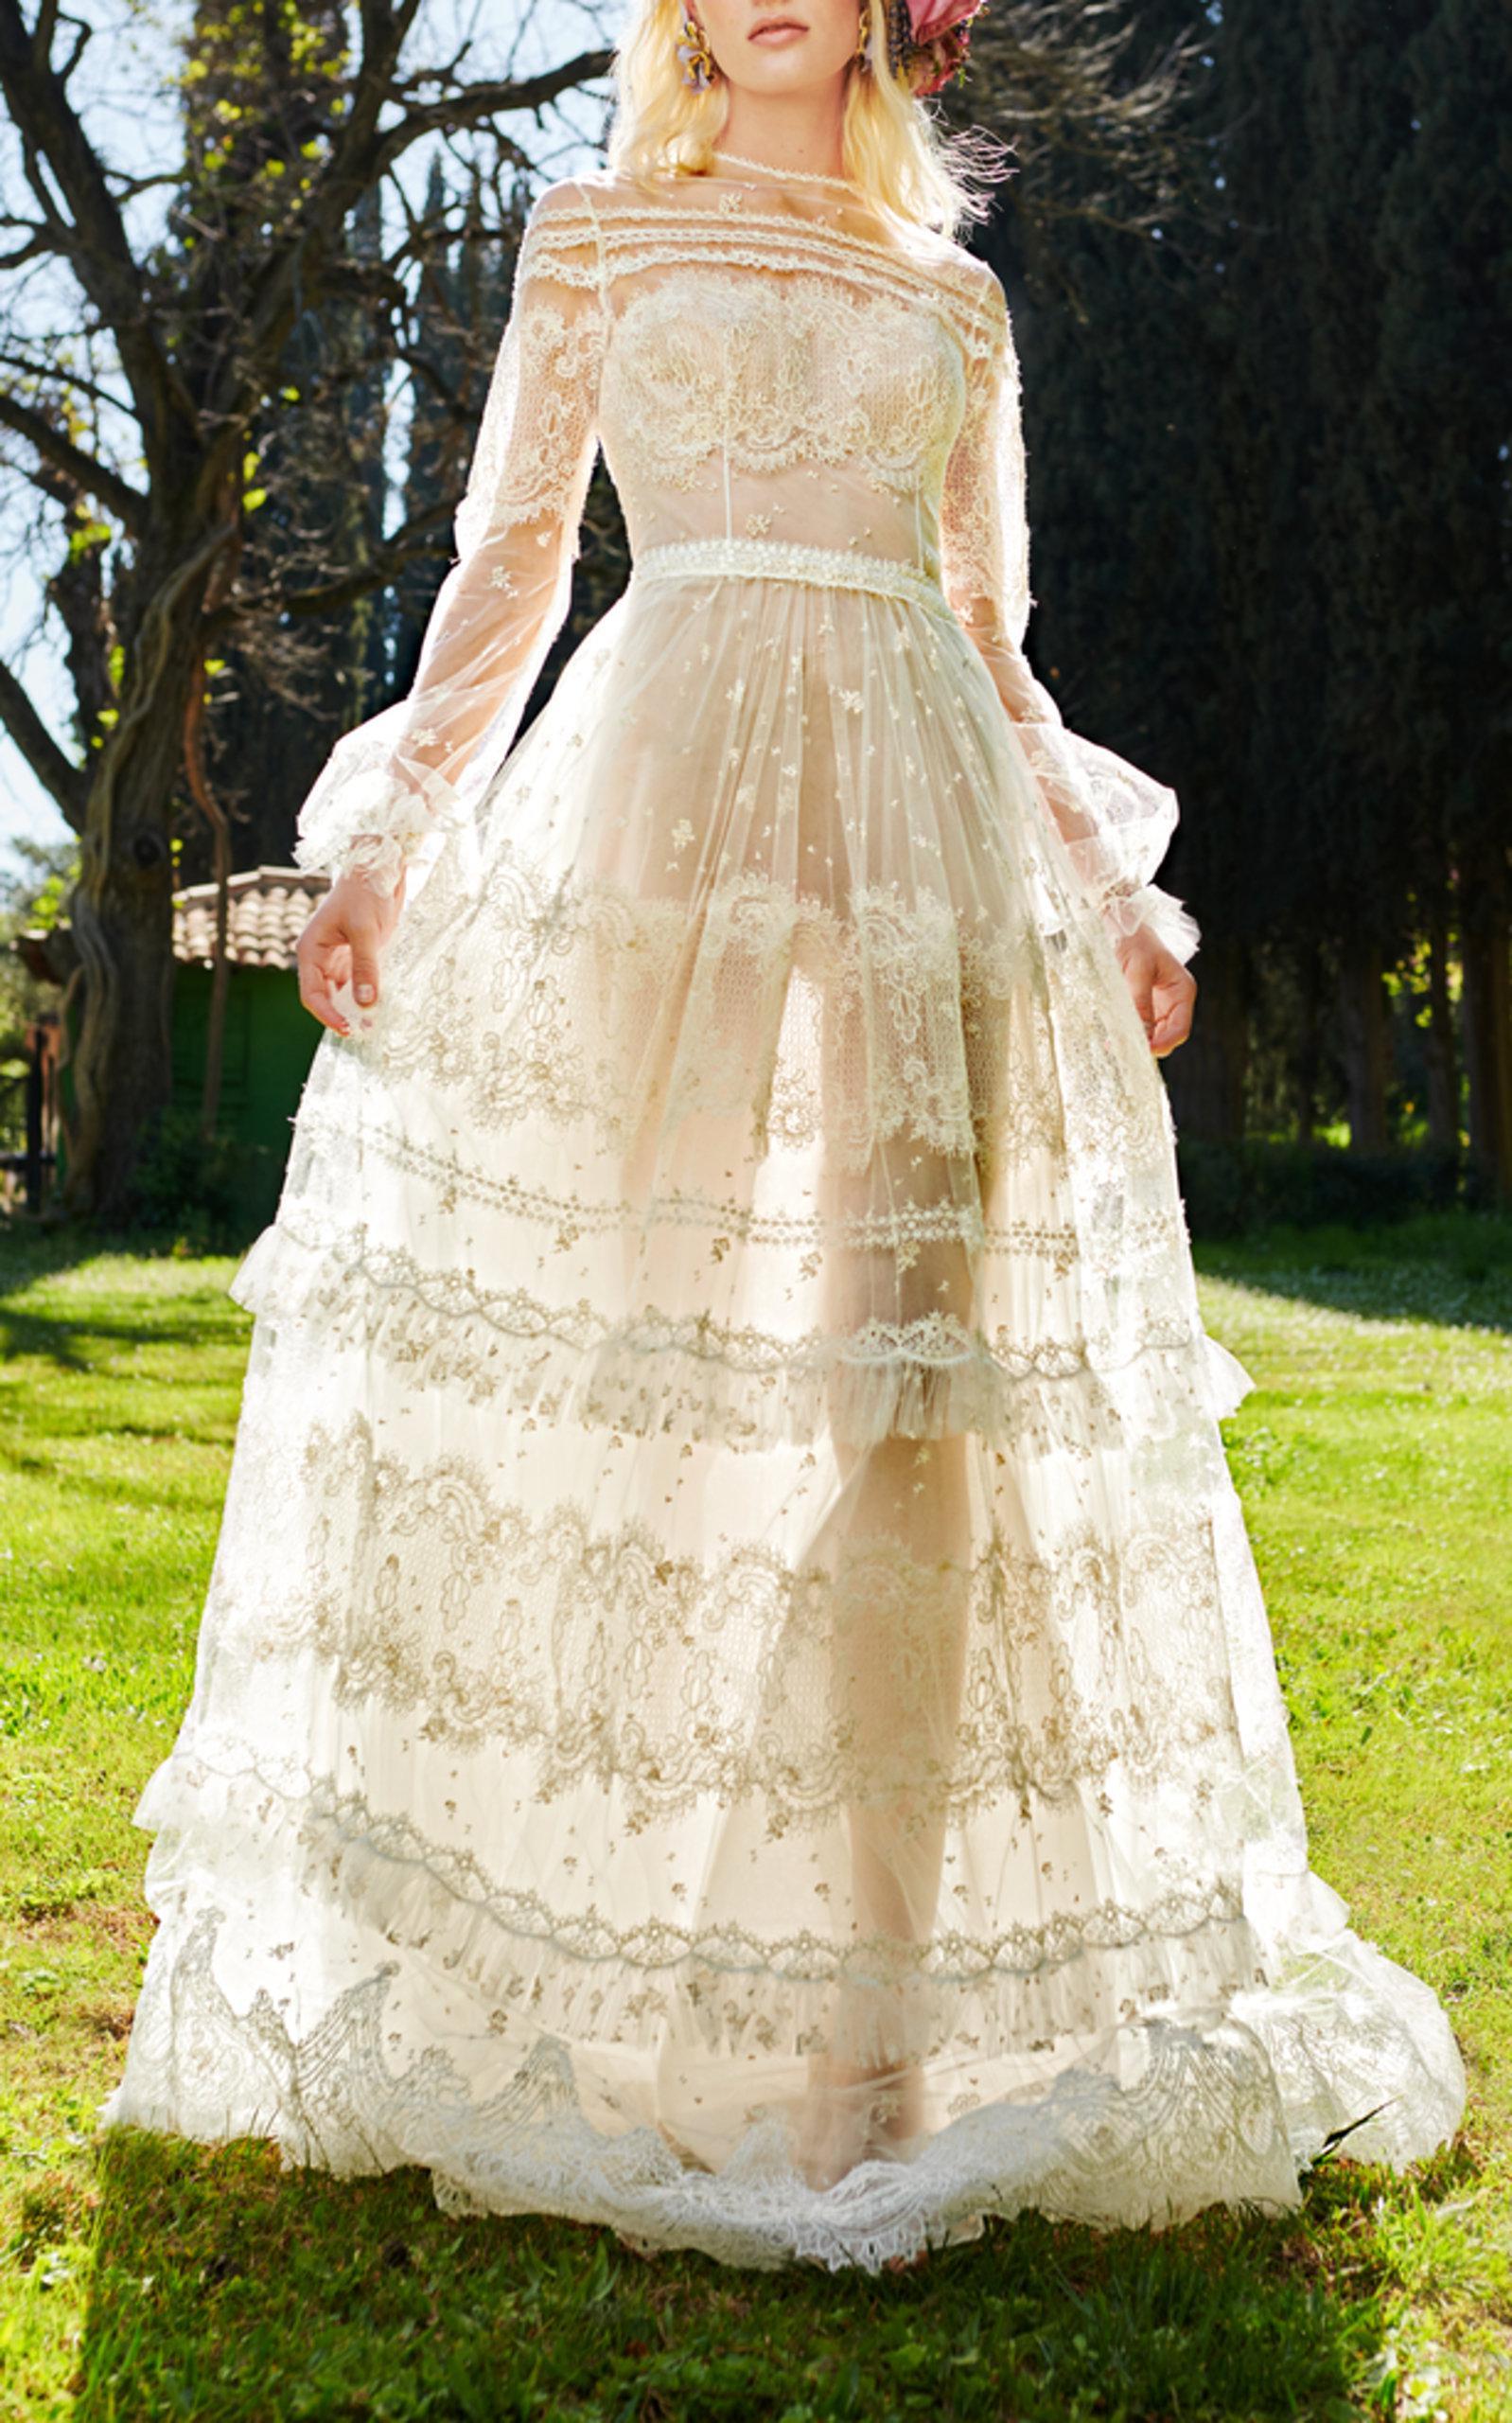 Lyst - Costarellos Bridal Romantic Gossamer Gown in White